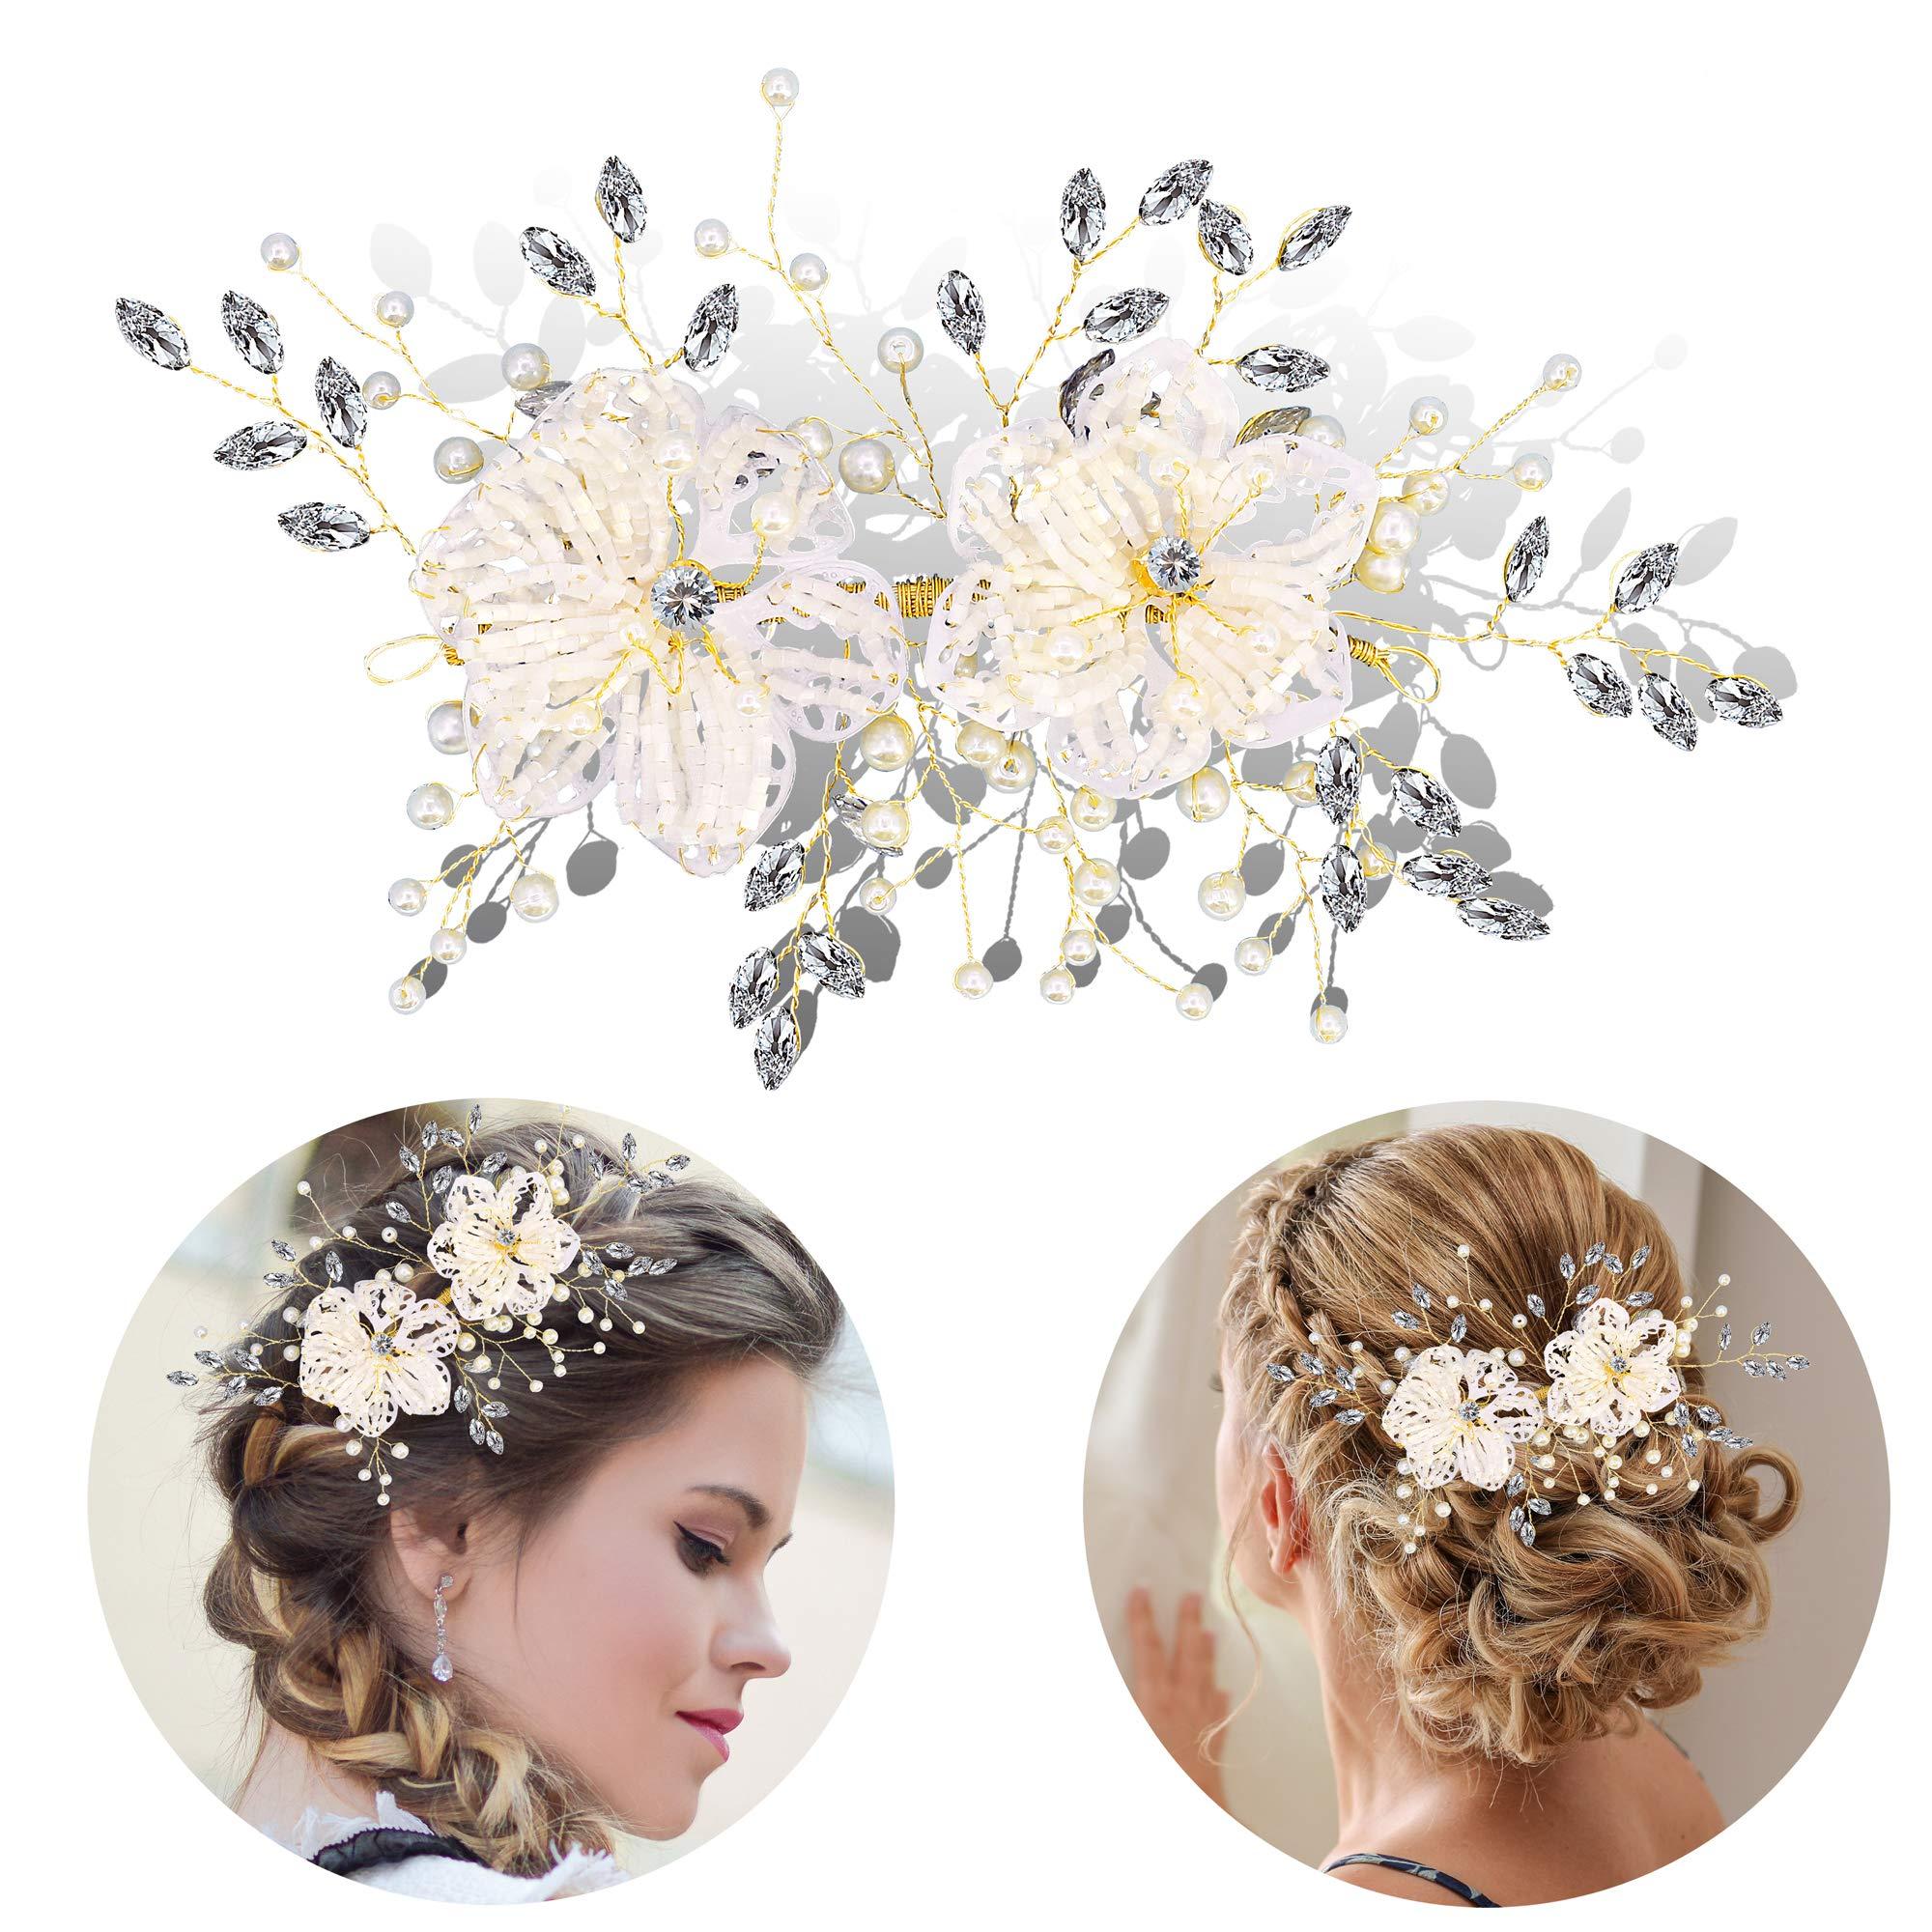 Bocianelli Wedding Headpieces Flower Wreath, Pearls Headband Tiara, Crystals Hair Accessories for Bride Bridesmaid, (Silver & Gold)